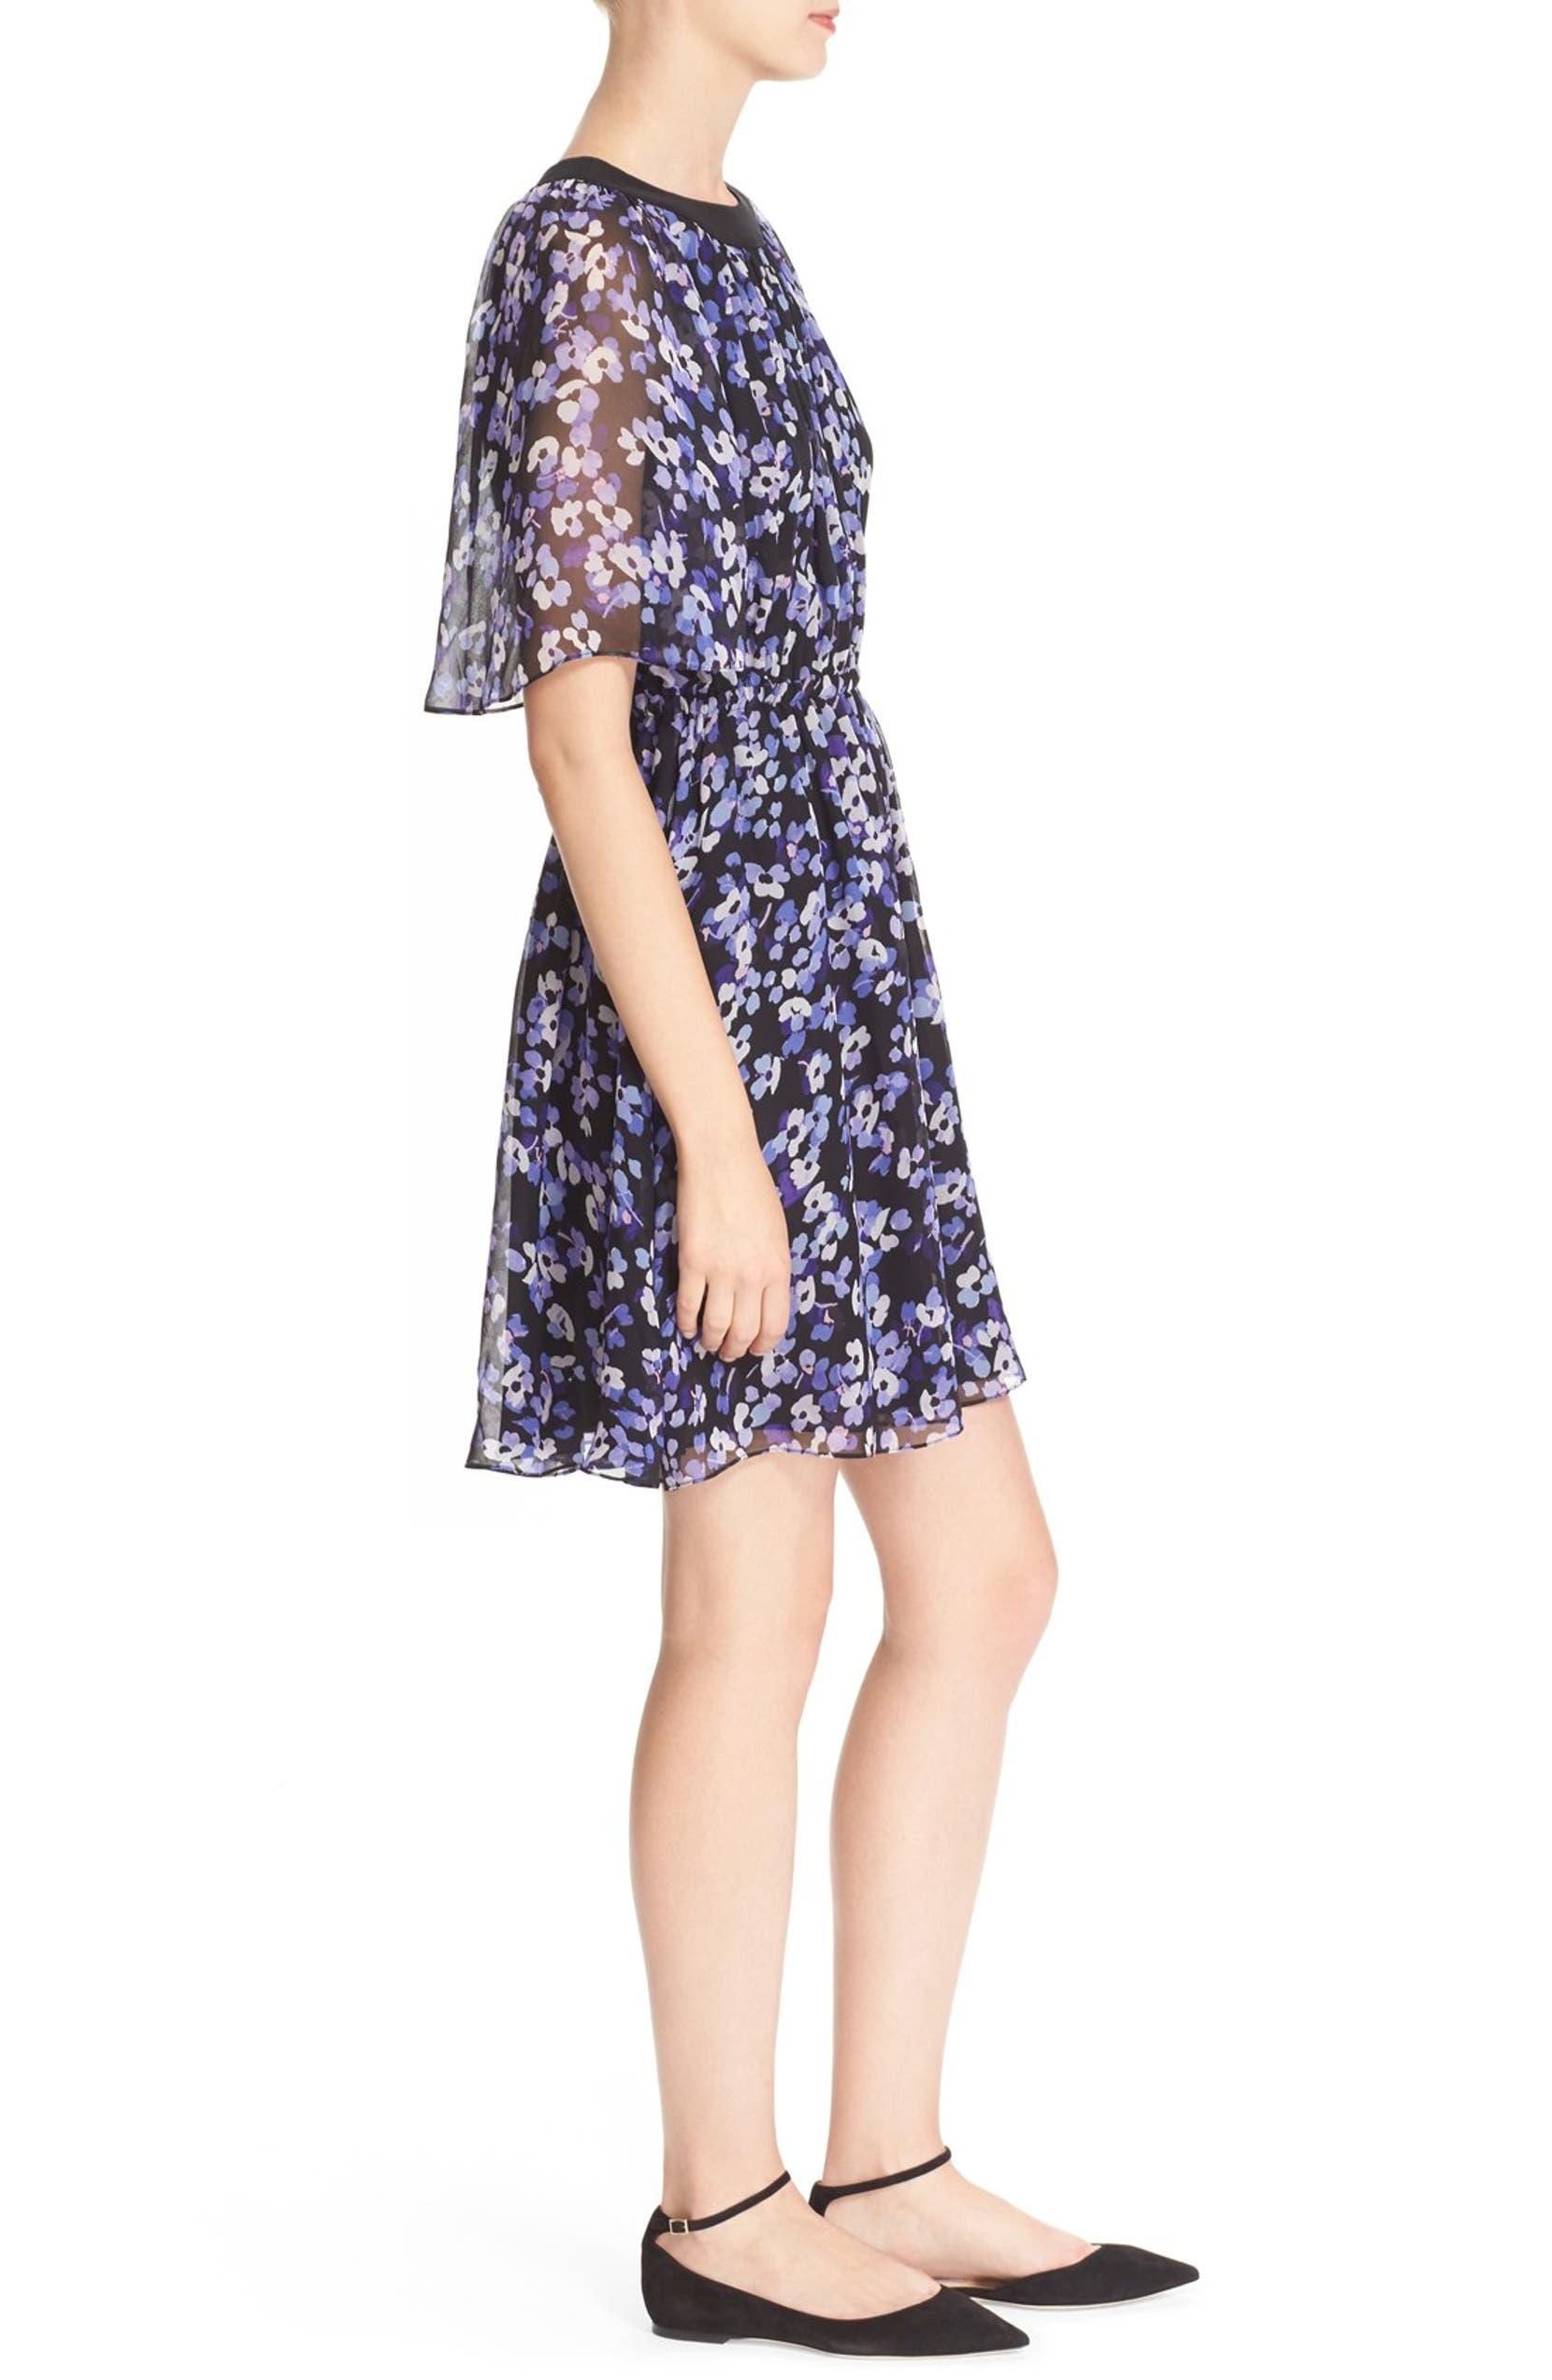 31f91d793b578 kate spade new york hydrangea print chiffon dress | Nordstrom